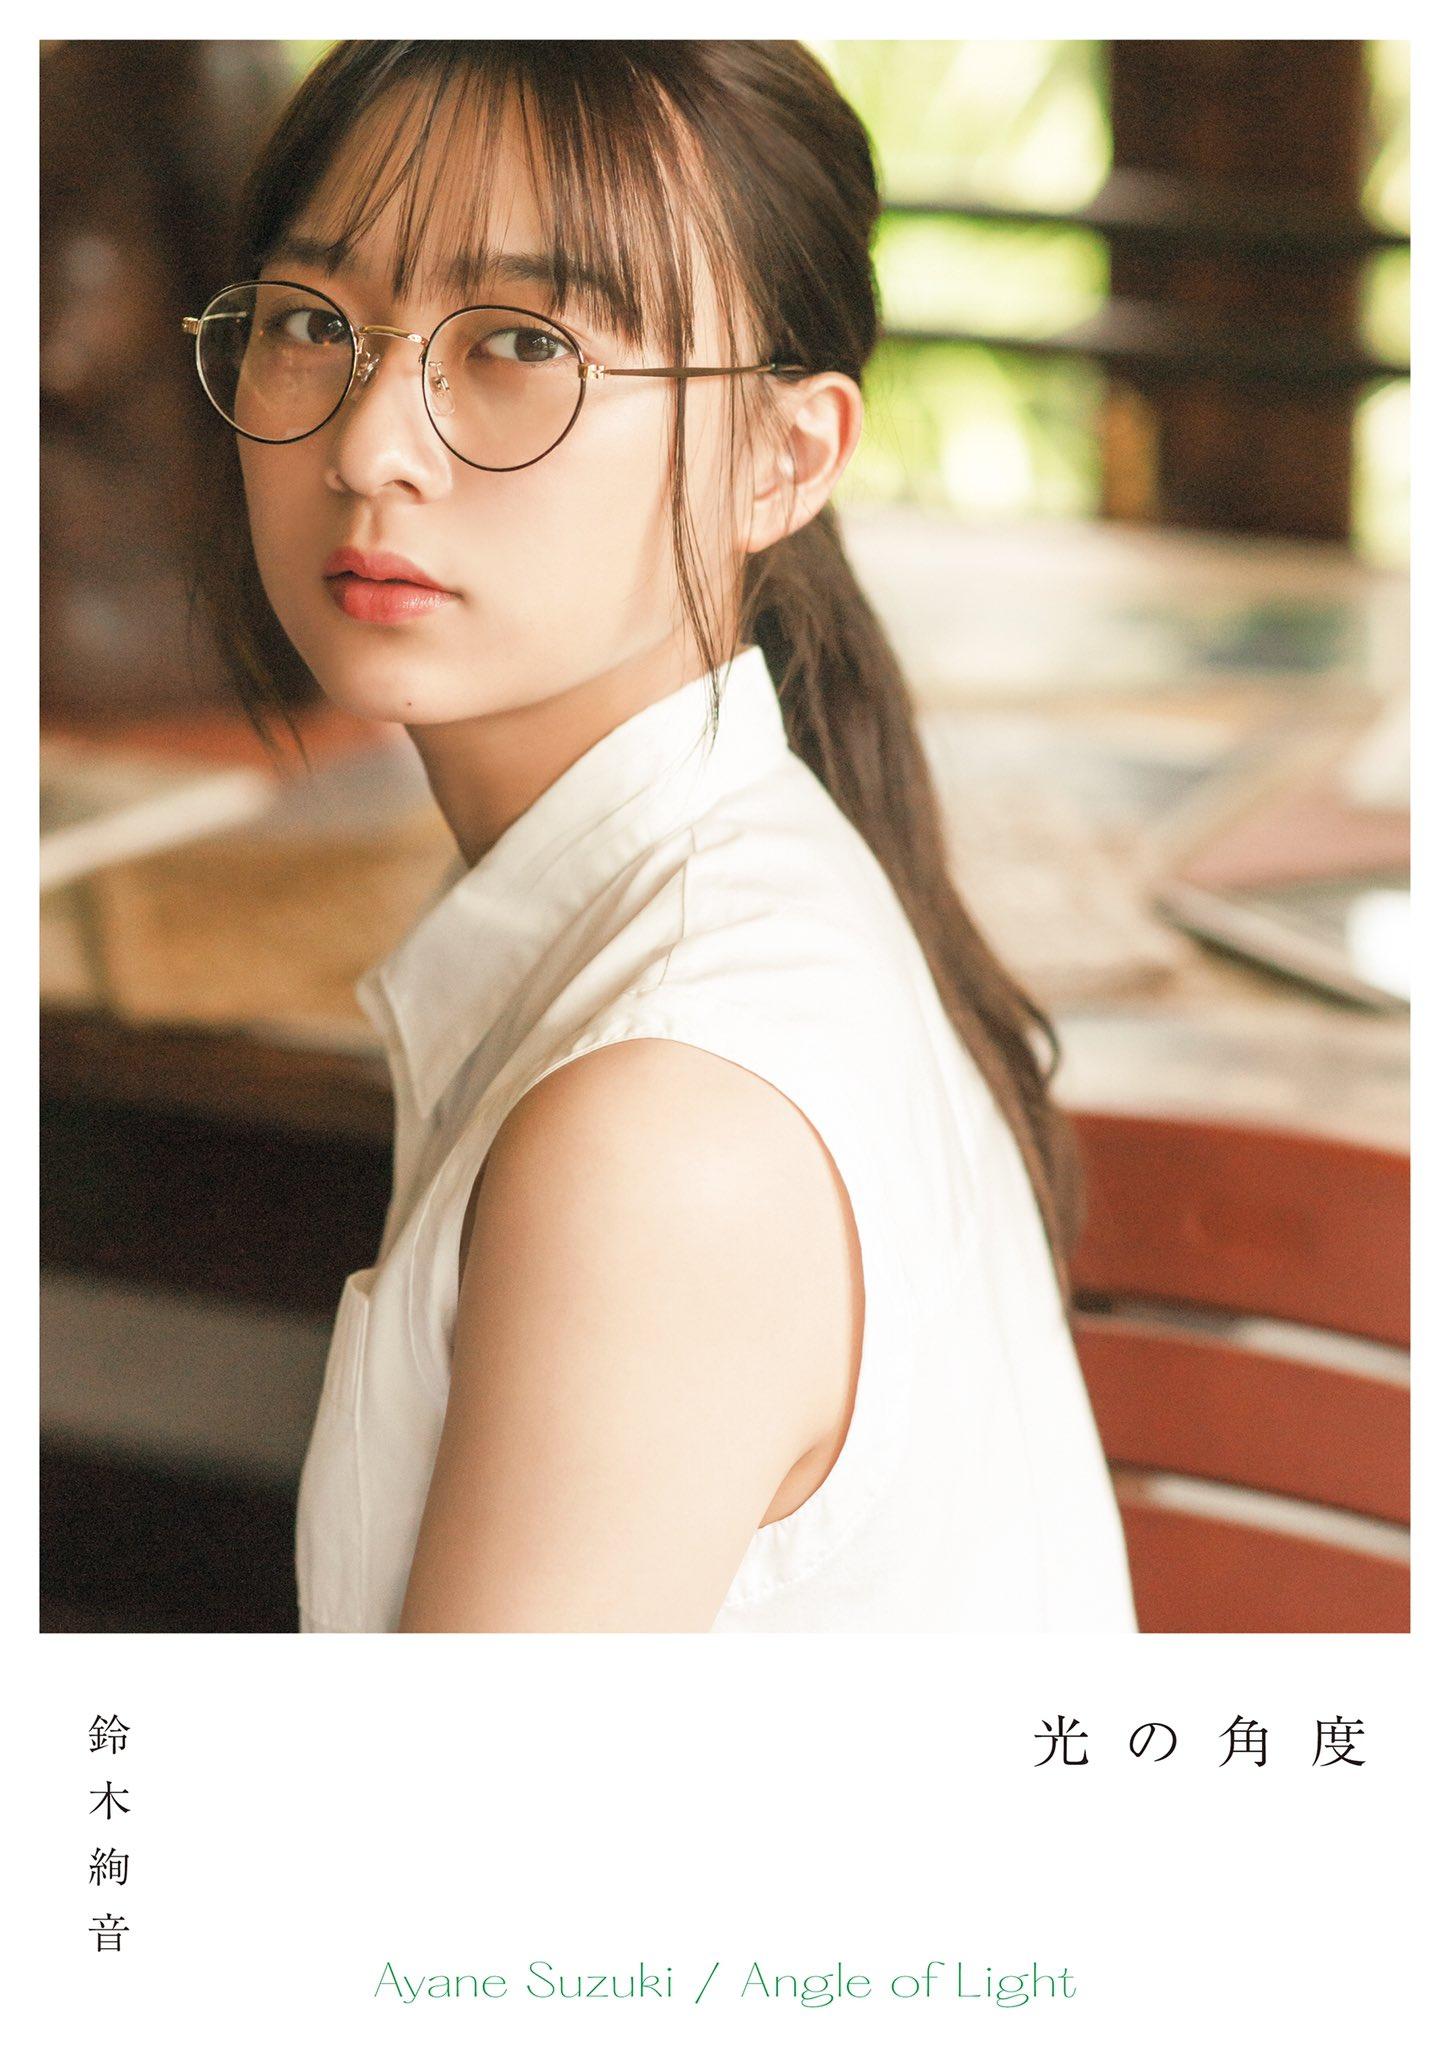 鈴木絢音1st写真集『光の角度』セブンネット限定版表紙